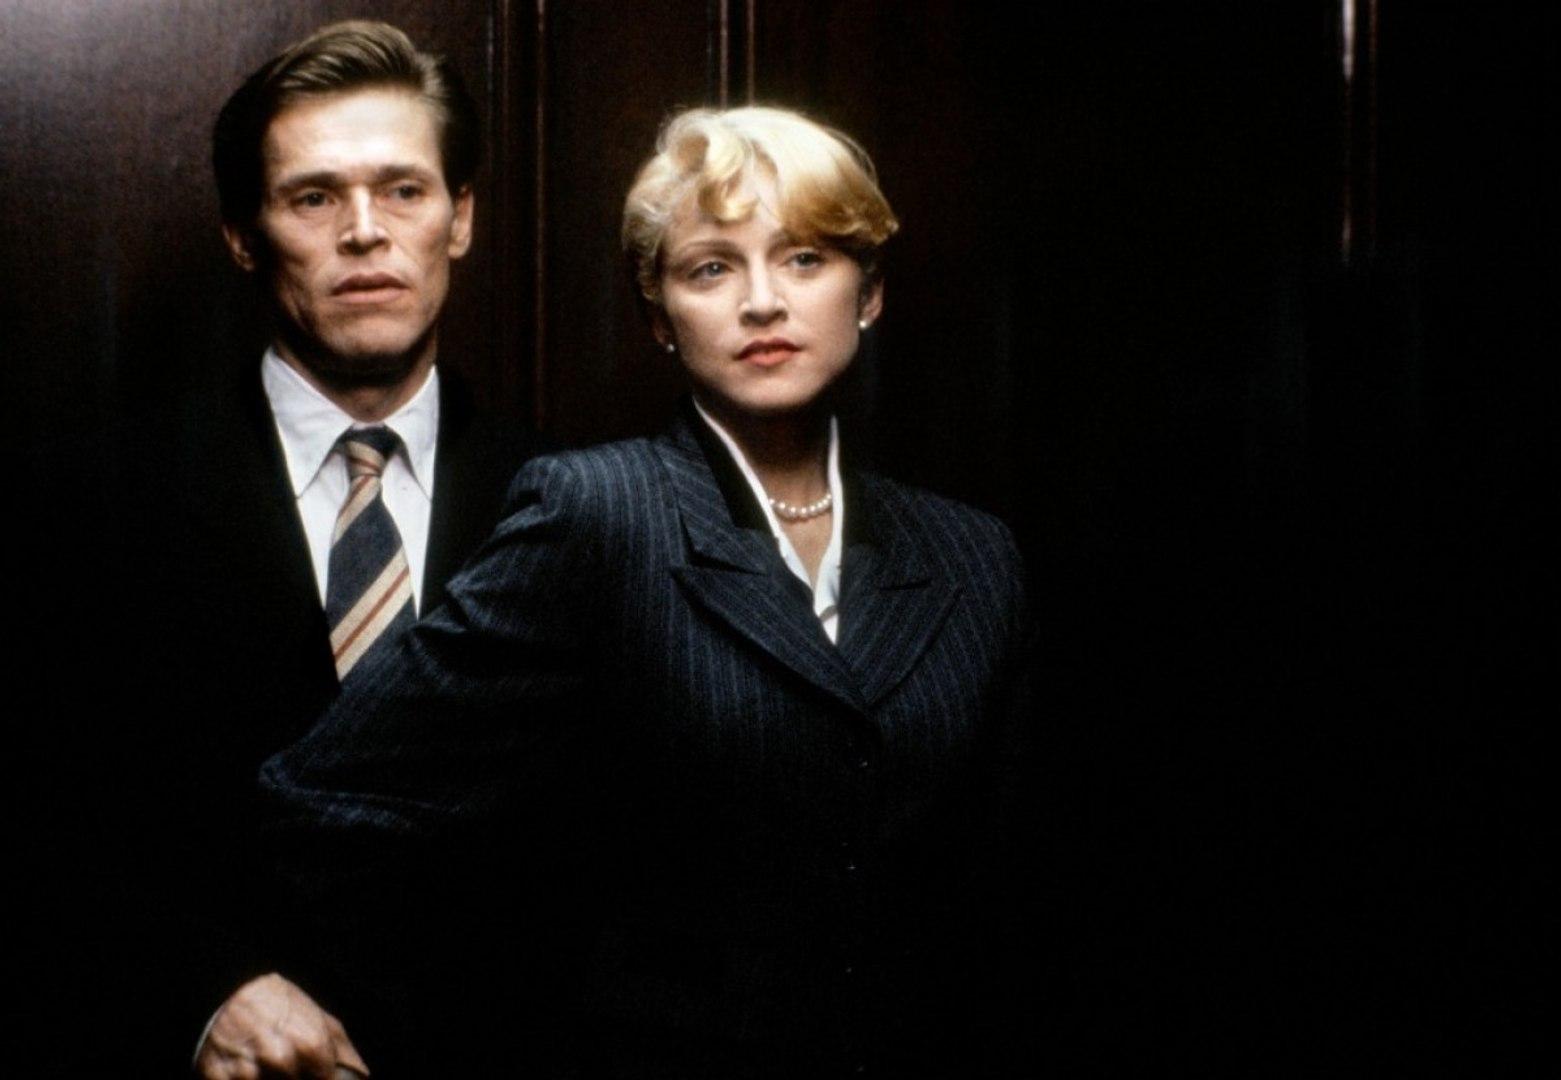 Body of Evidence movie (1993) - Madonna, Willem Dafoe